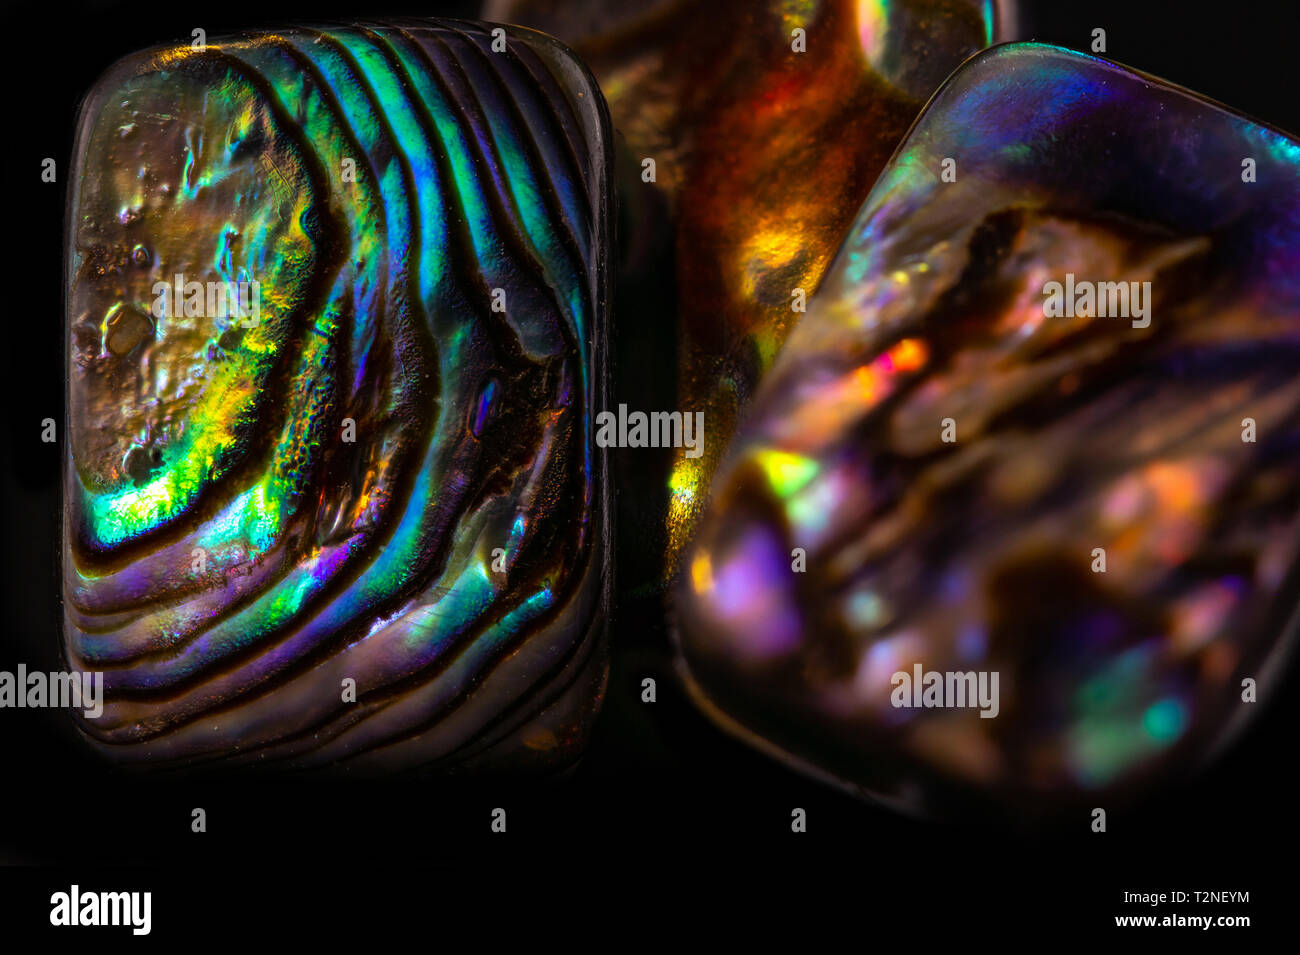 abstract gemstone background, colorful nacre shimmering on black background - Stock Image